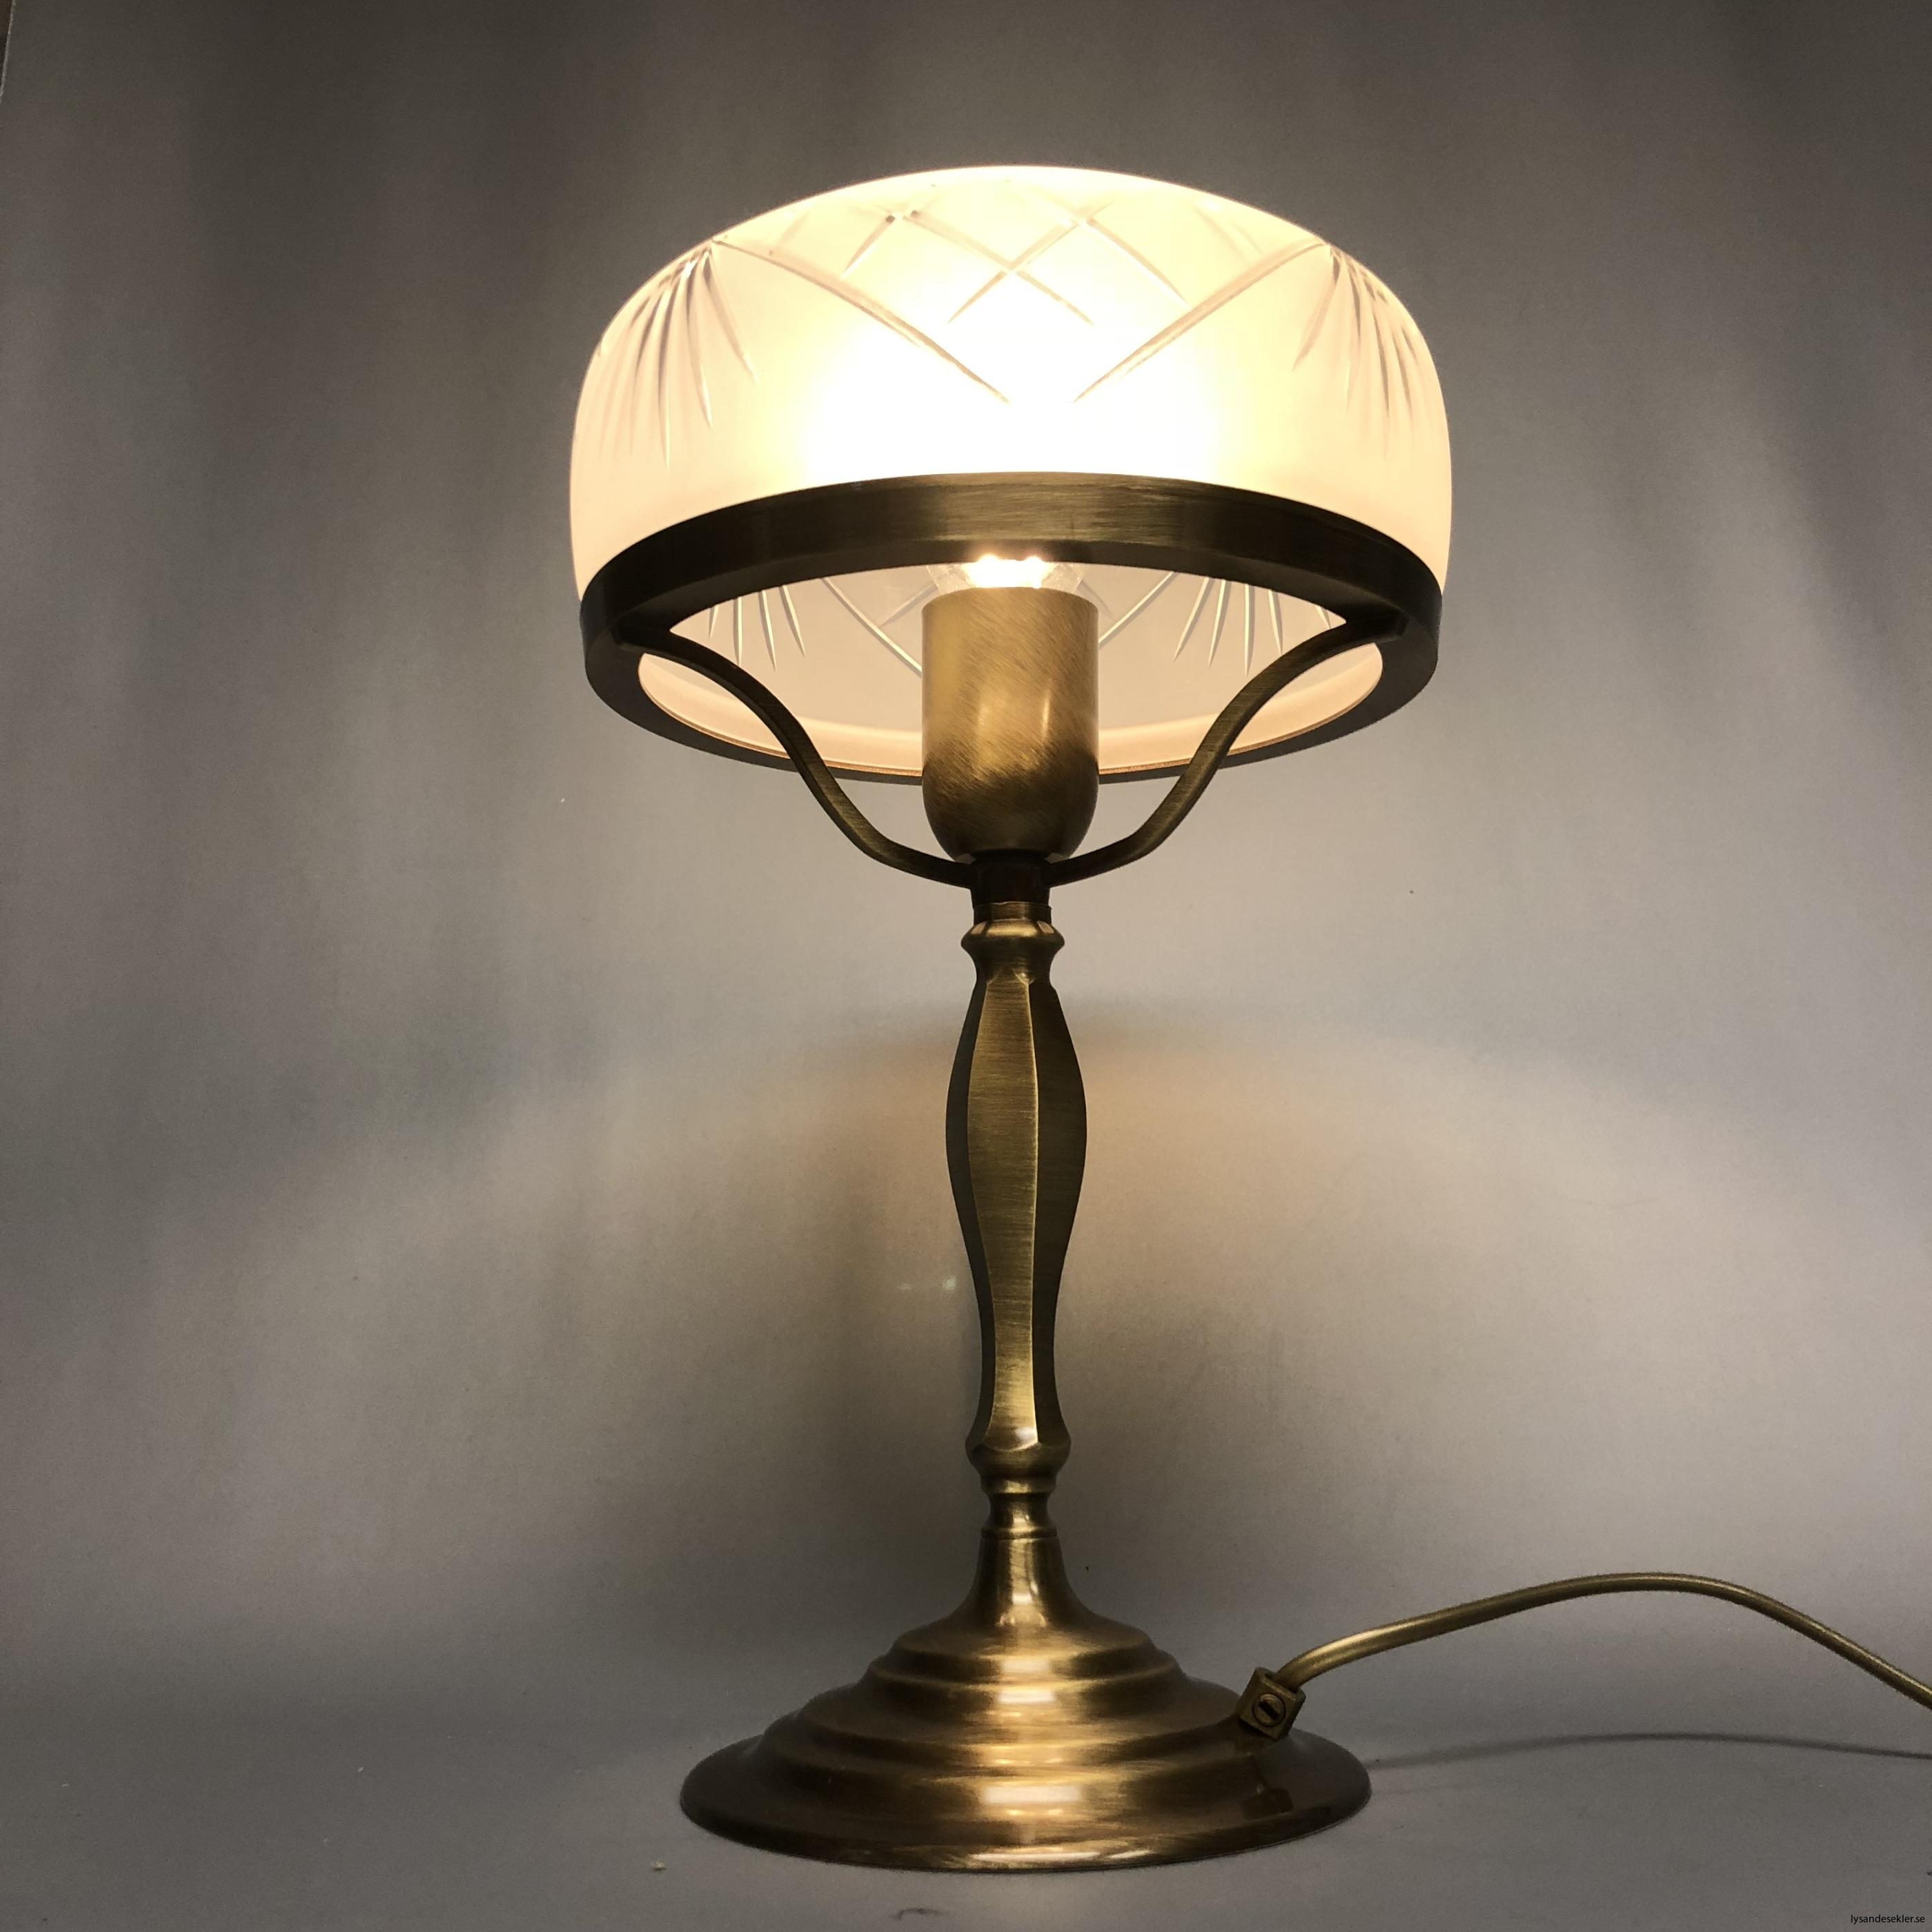 strindbergslampa strindbergslampor strindberg lampa skärm kupa strindbergsskärm strindbergskupa27